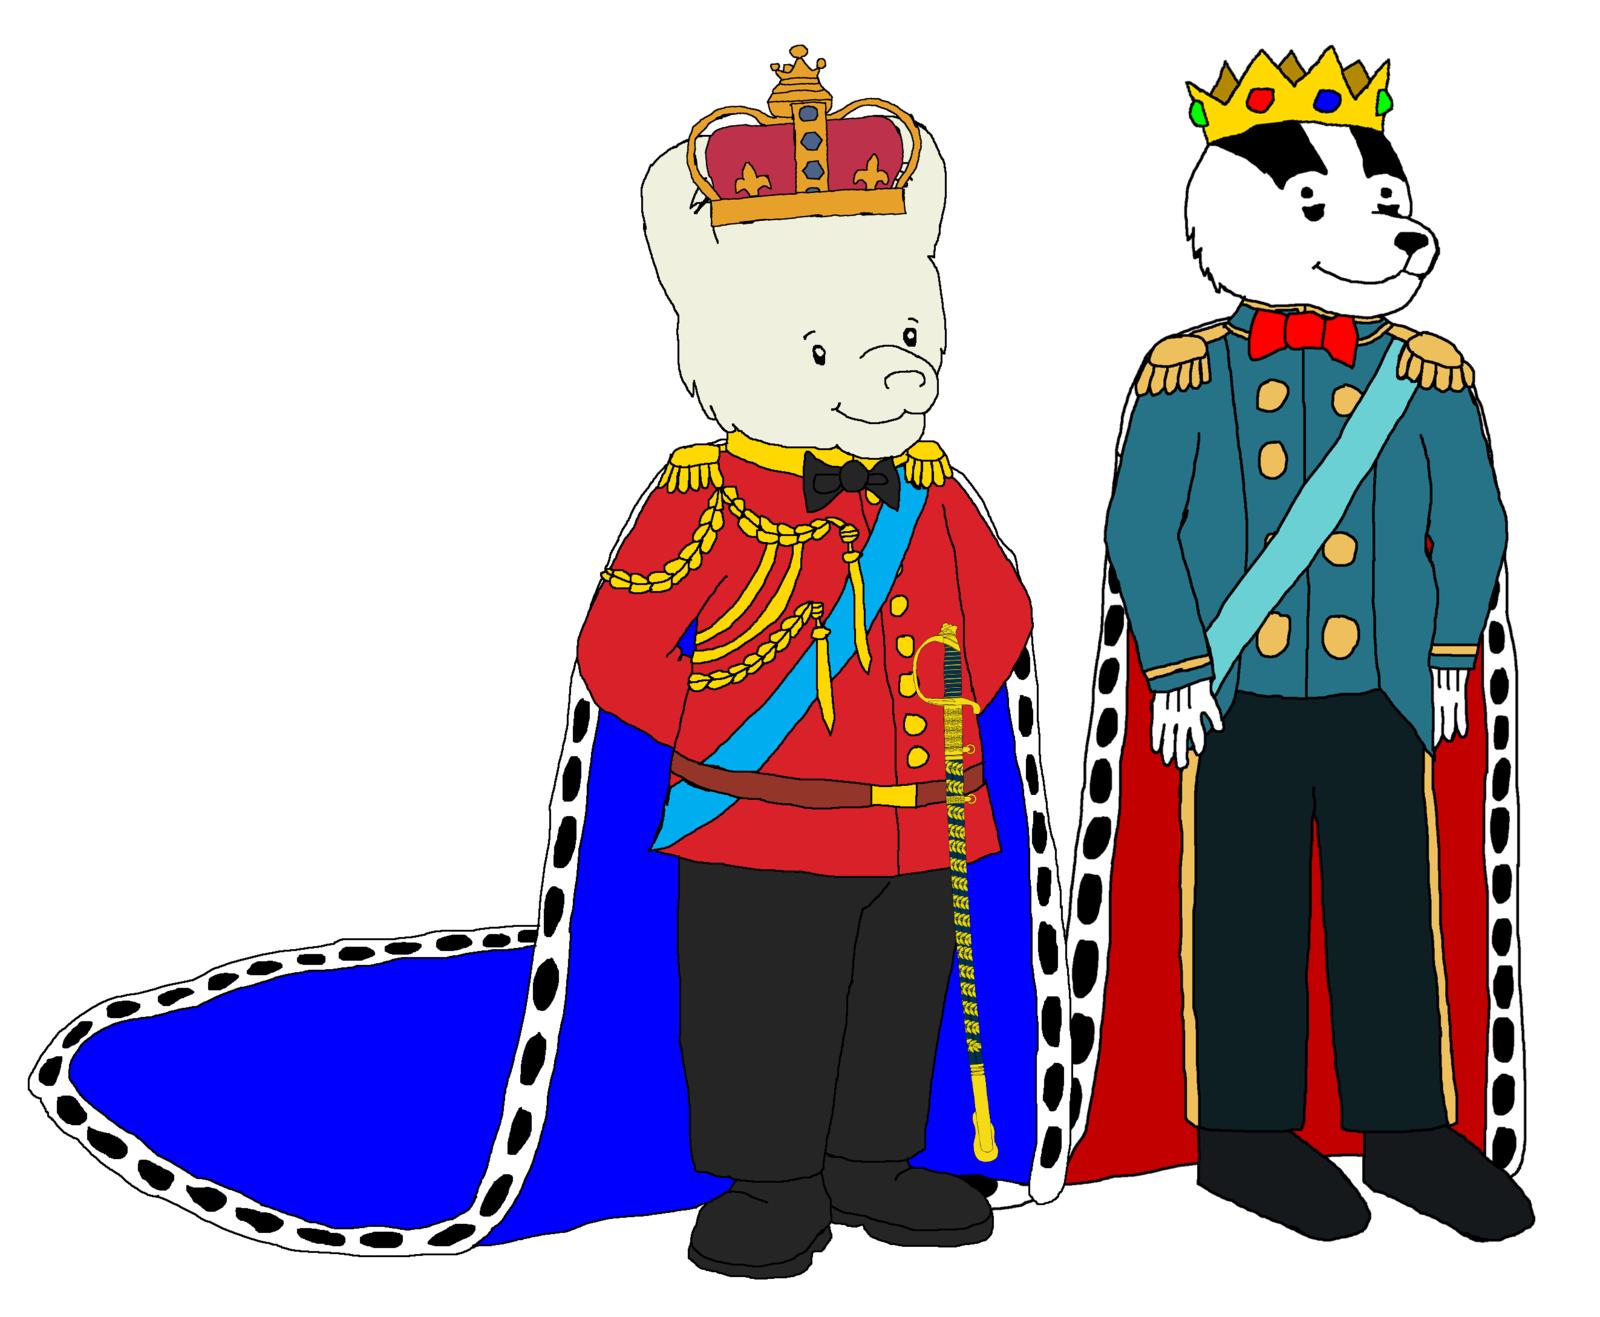 Prince Rupert and Prince Bill by KingLeonLionheart on DeviantArt.